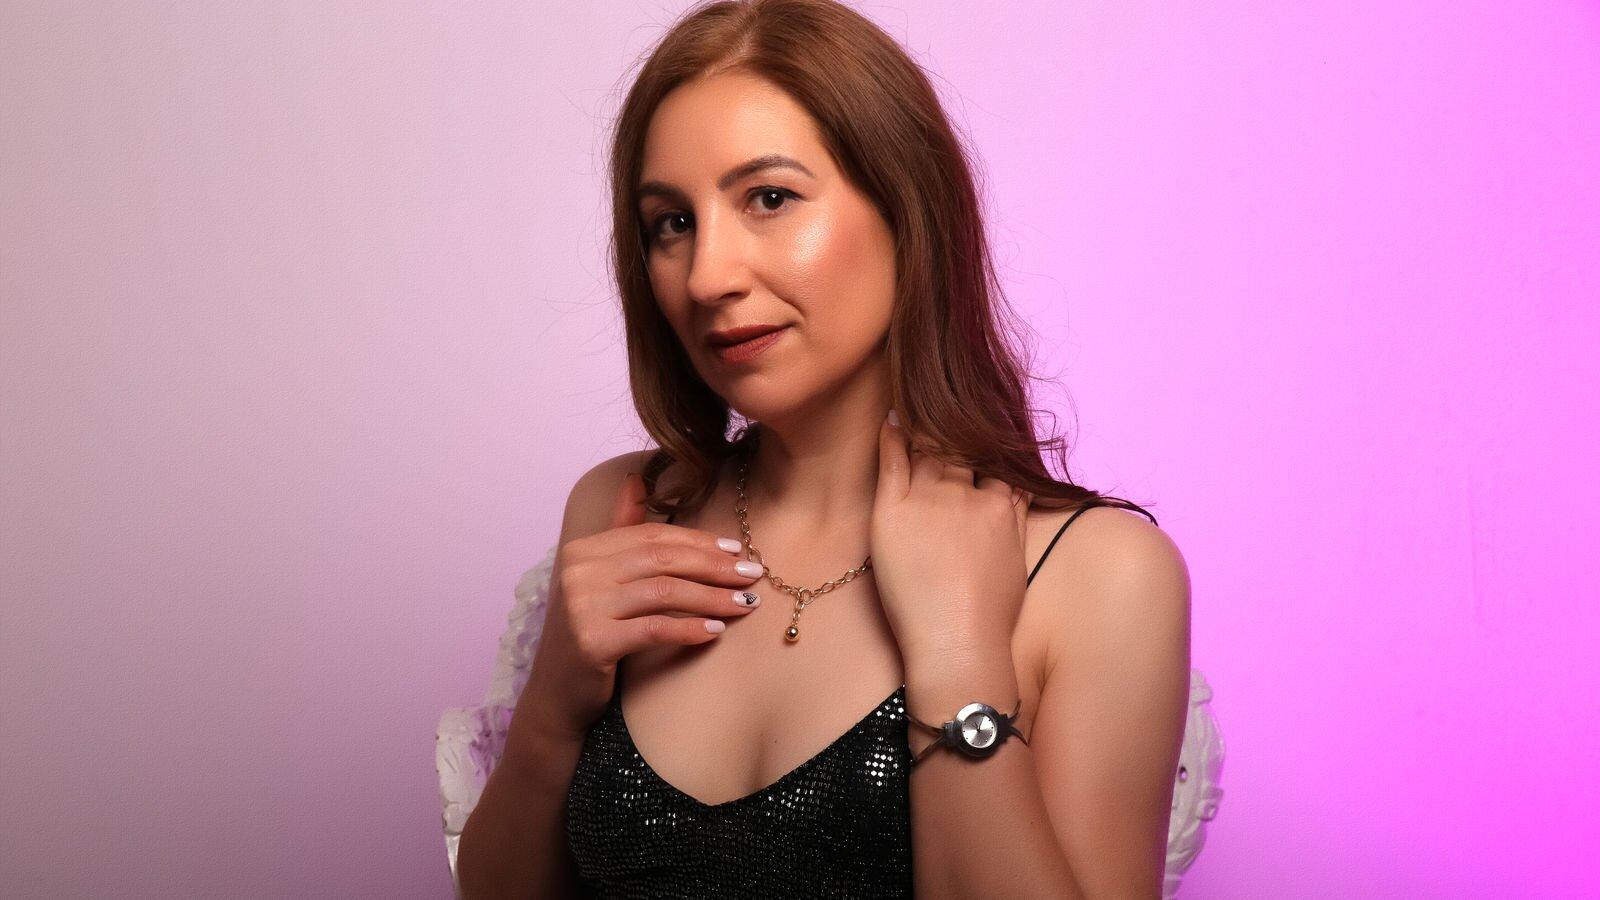 SexyMatureMiss